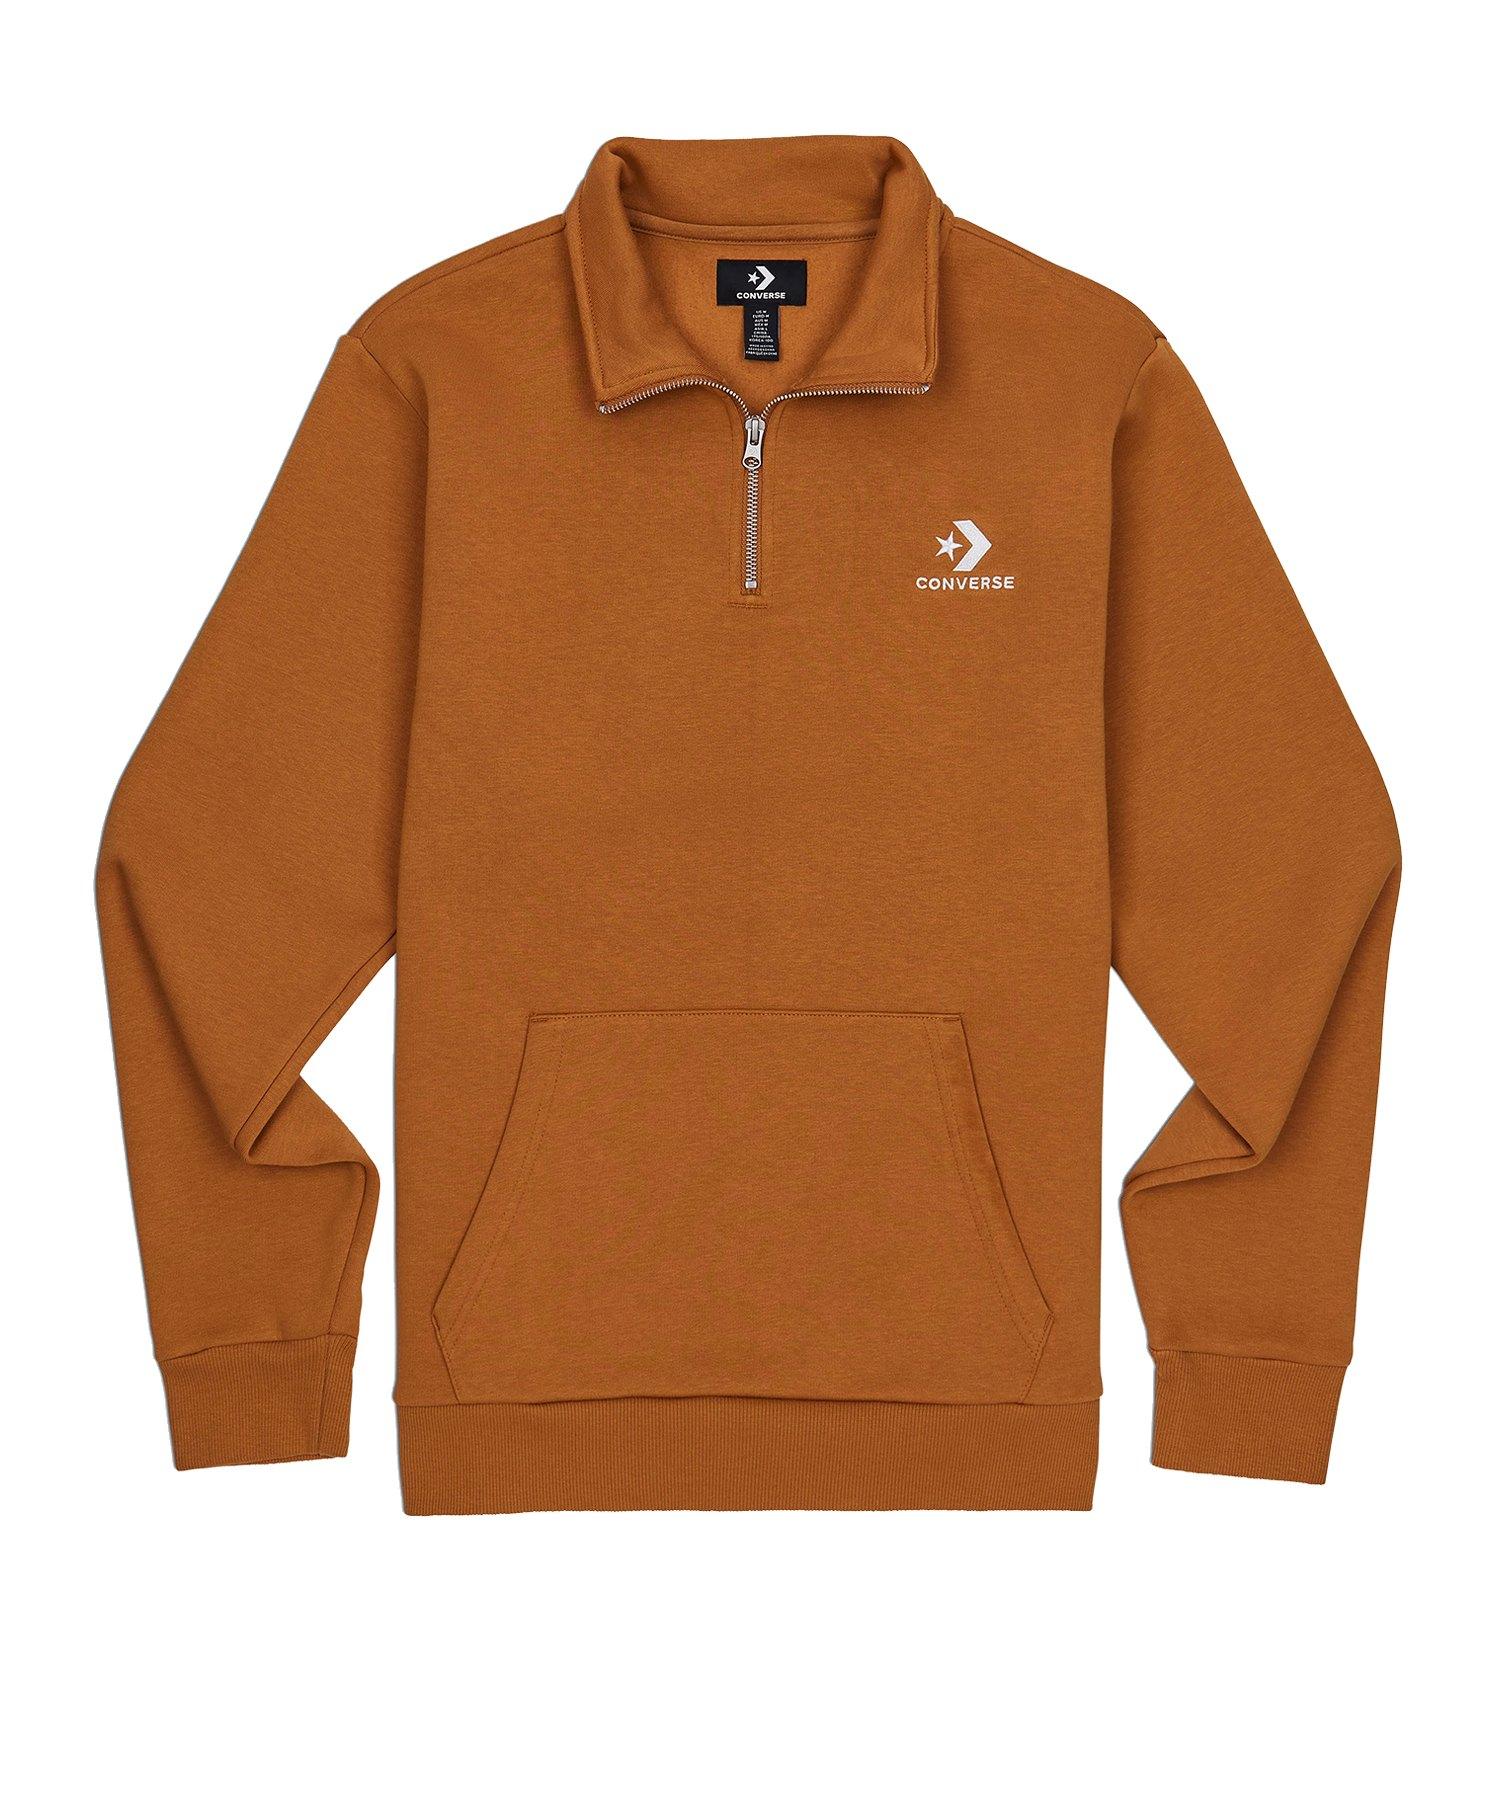 Converse Star Chev Half Zip Sweater Braun F212 - braun